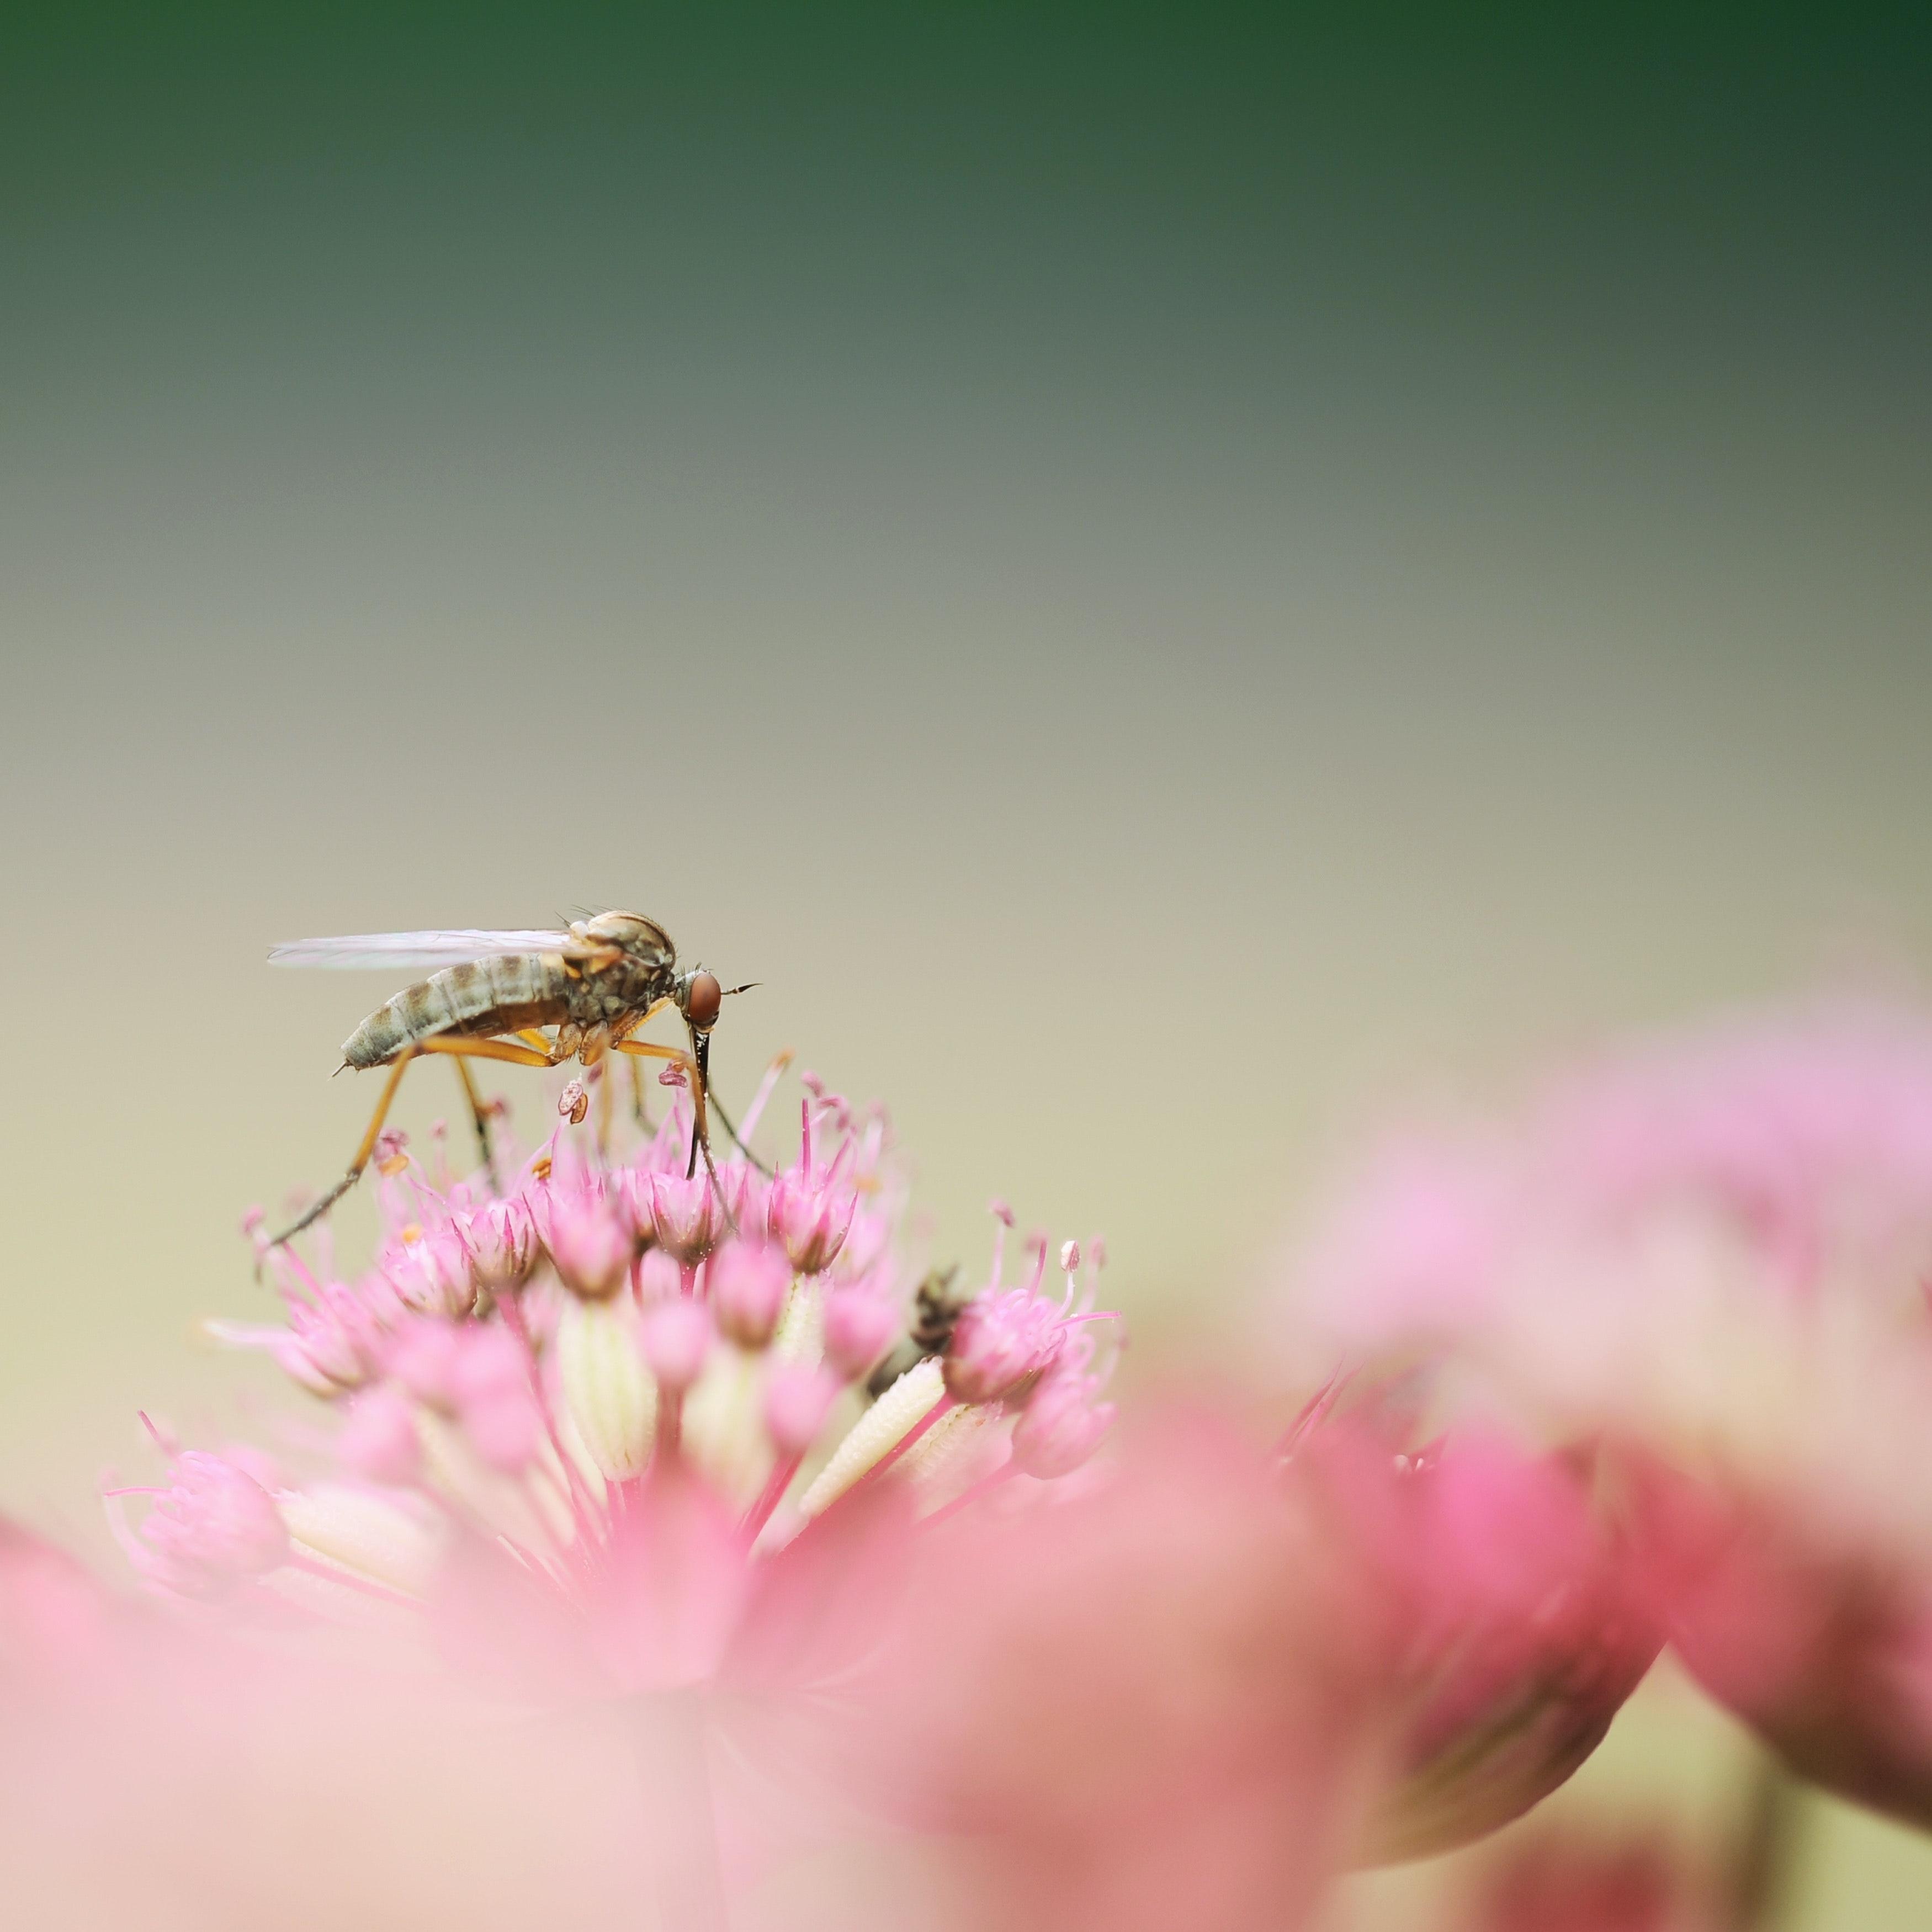 Grey weevil photo